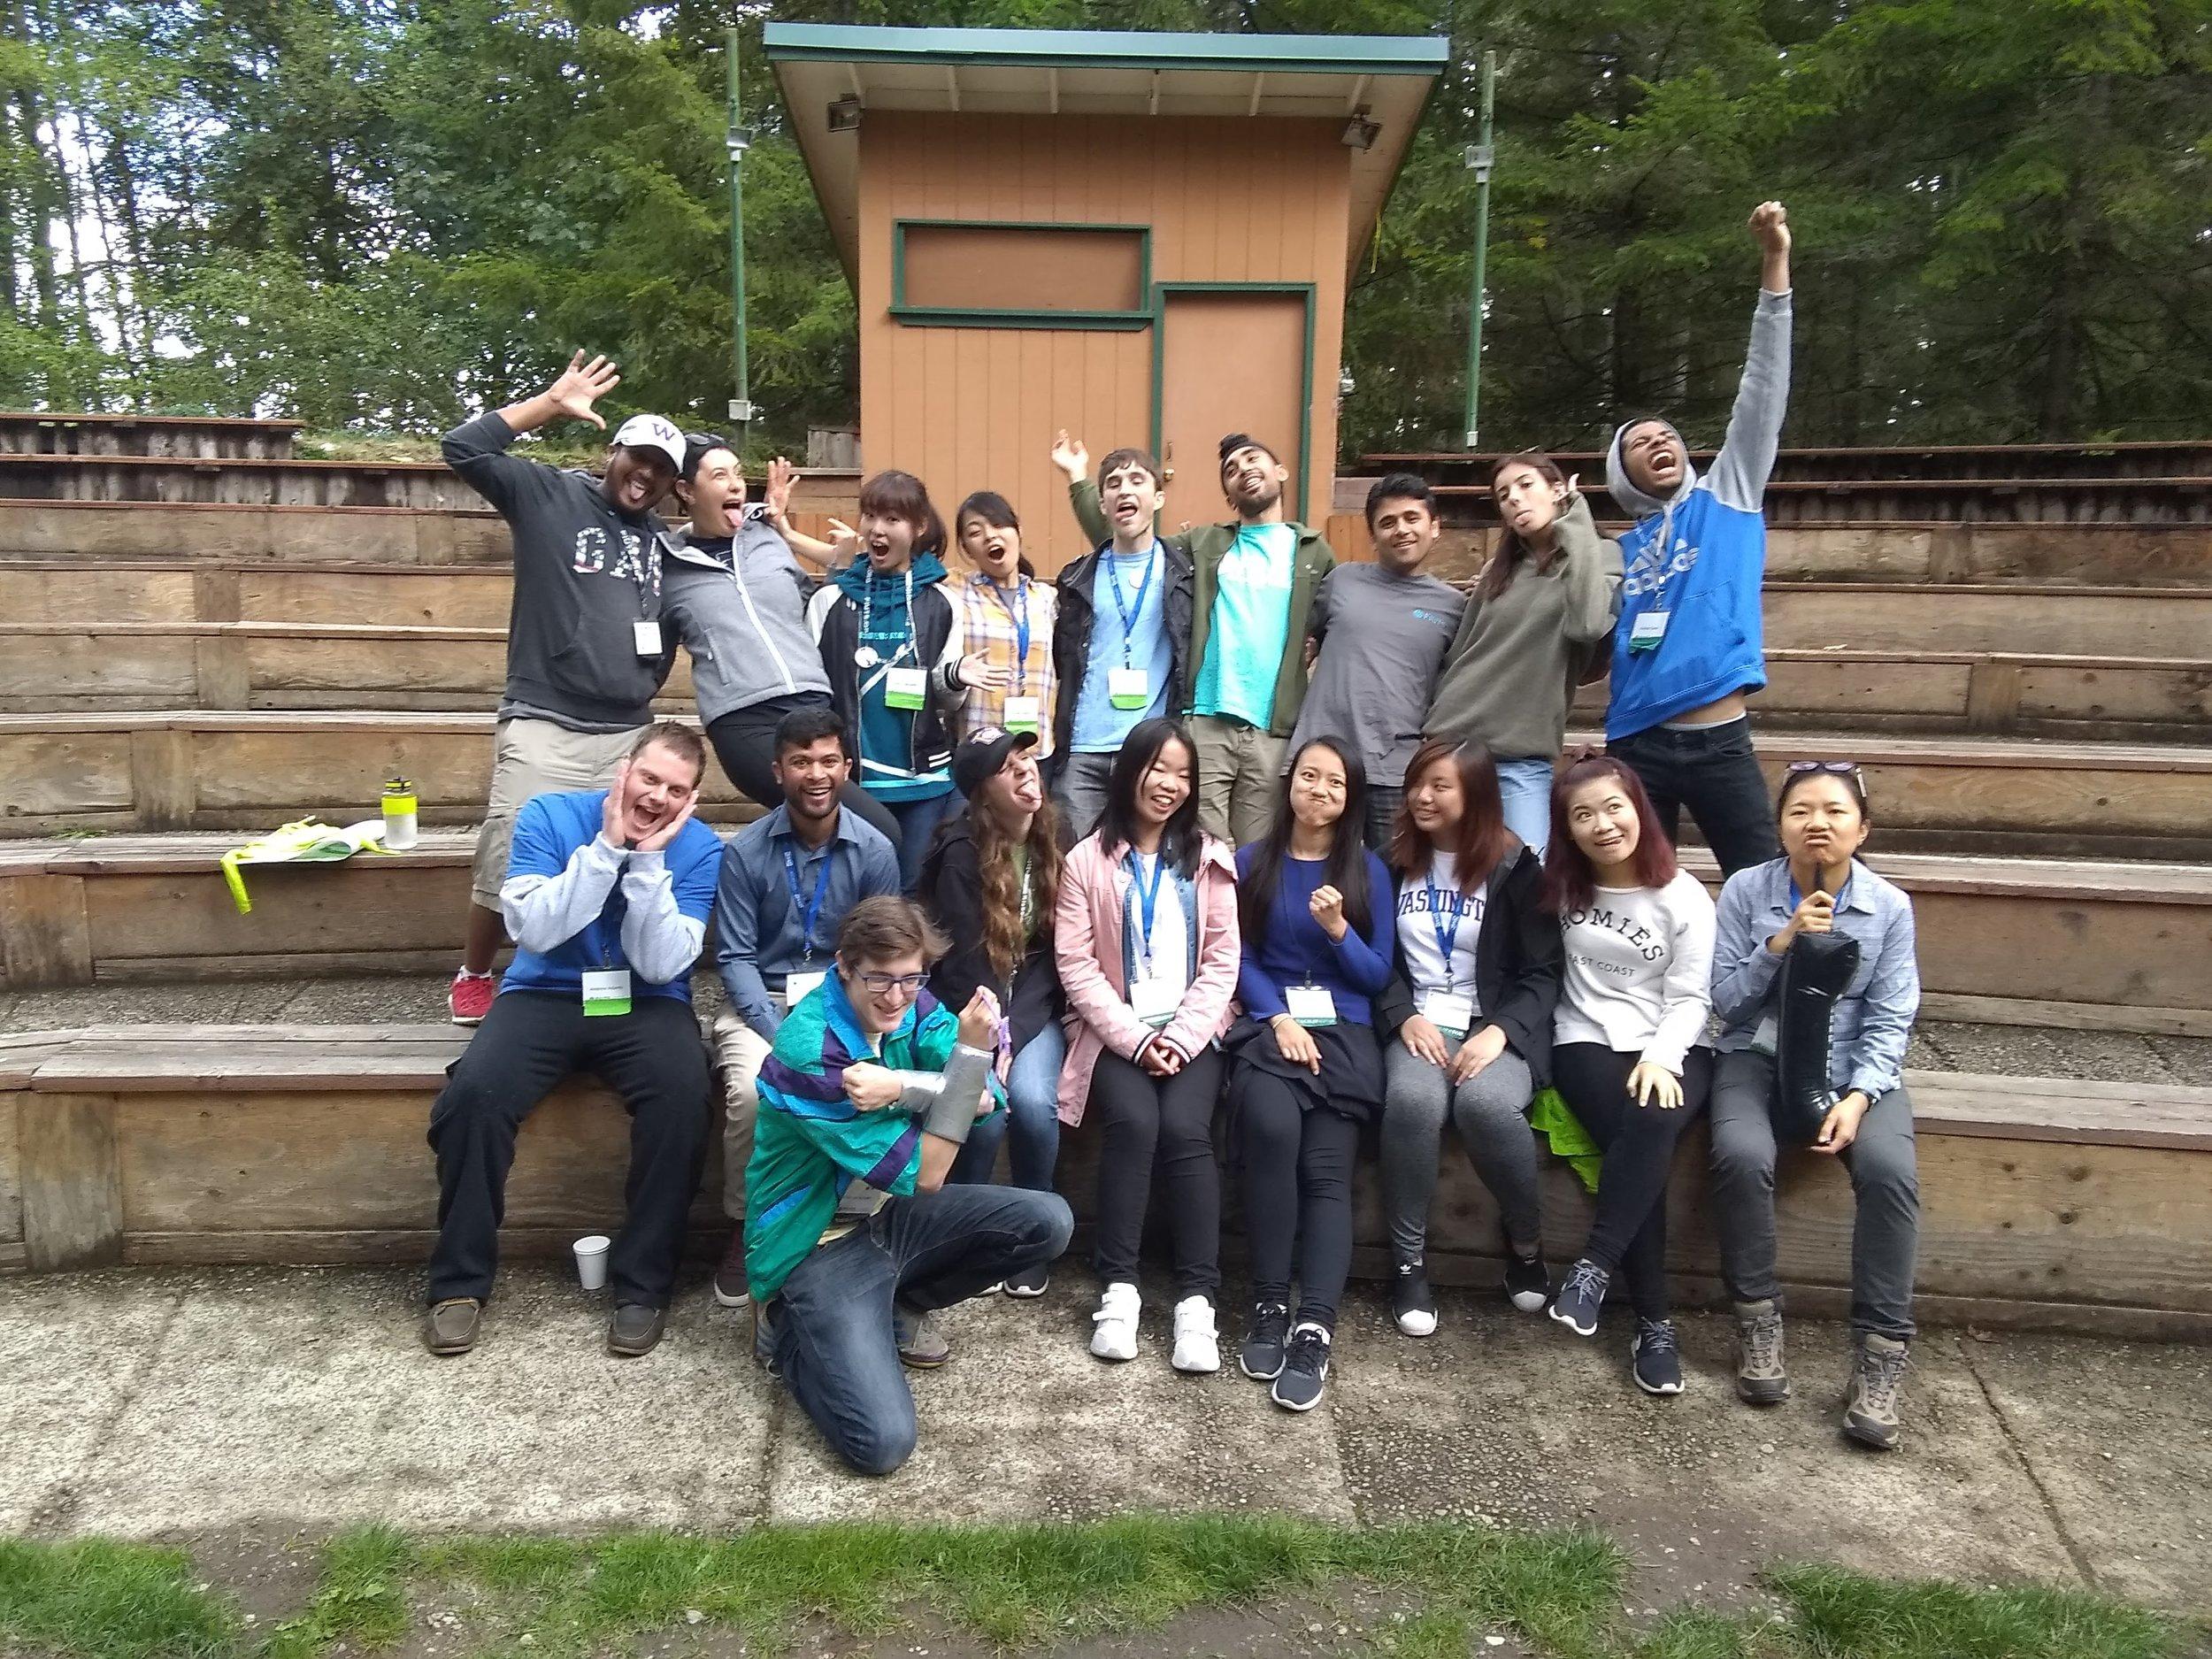 Keivon, far right back row, and fellow facilitators at FIUTS Camp 2018